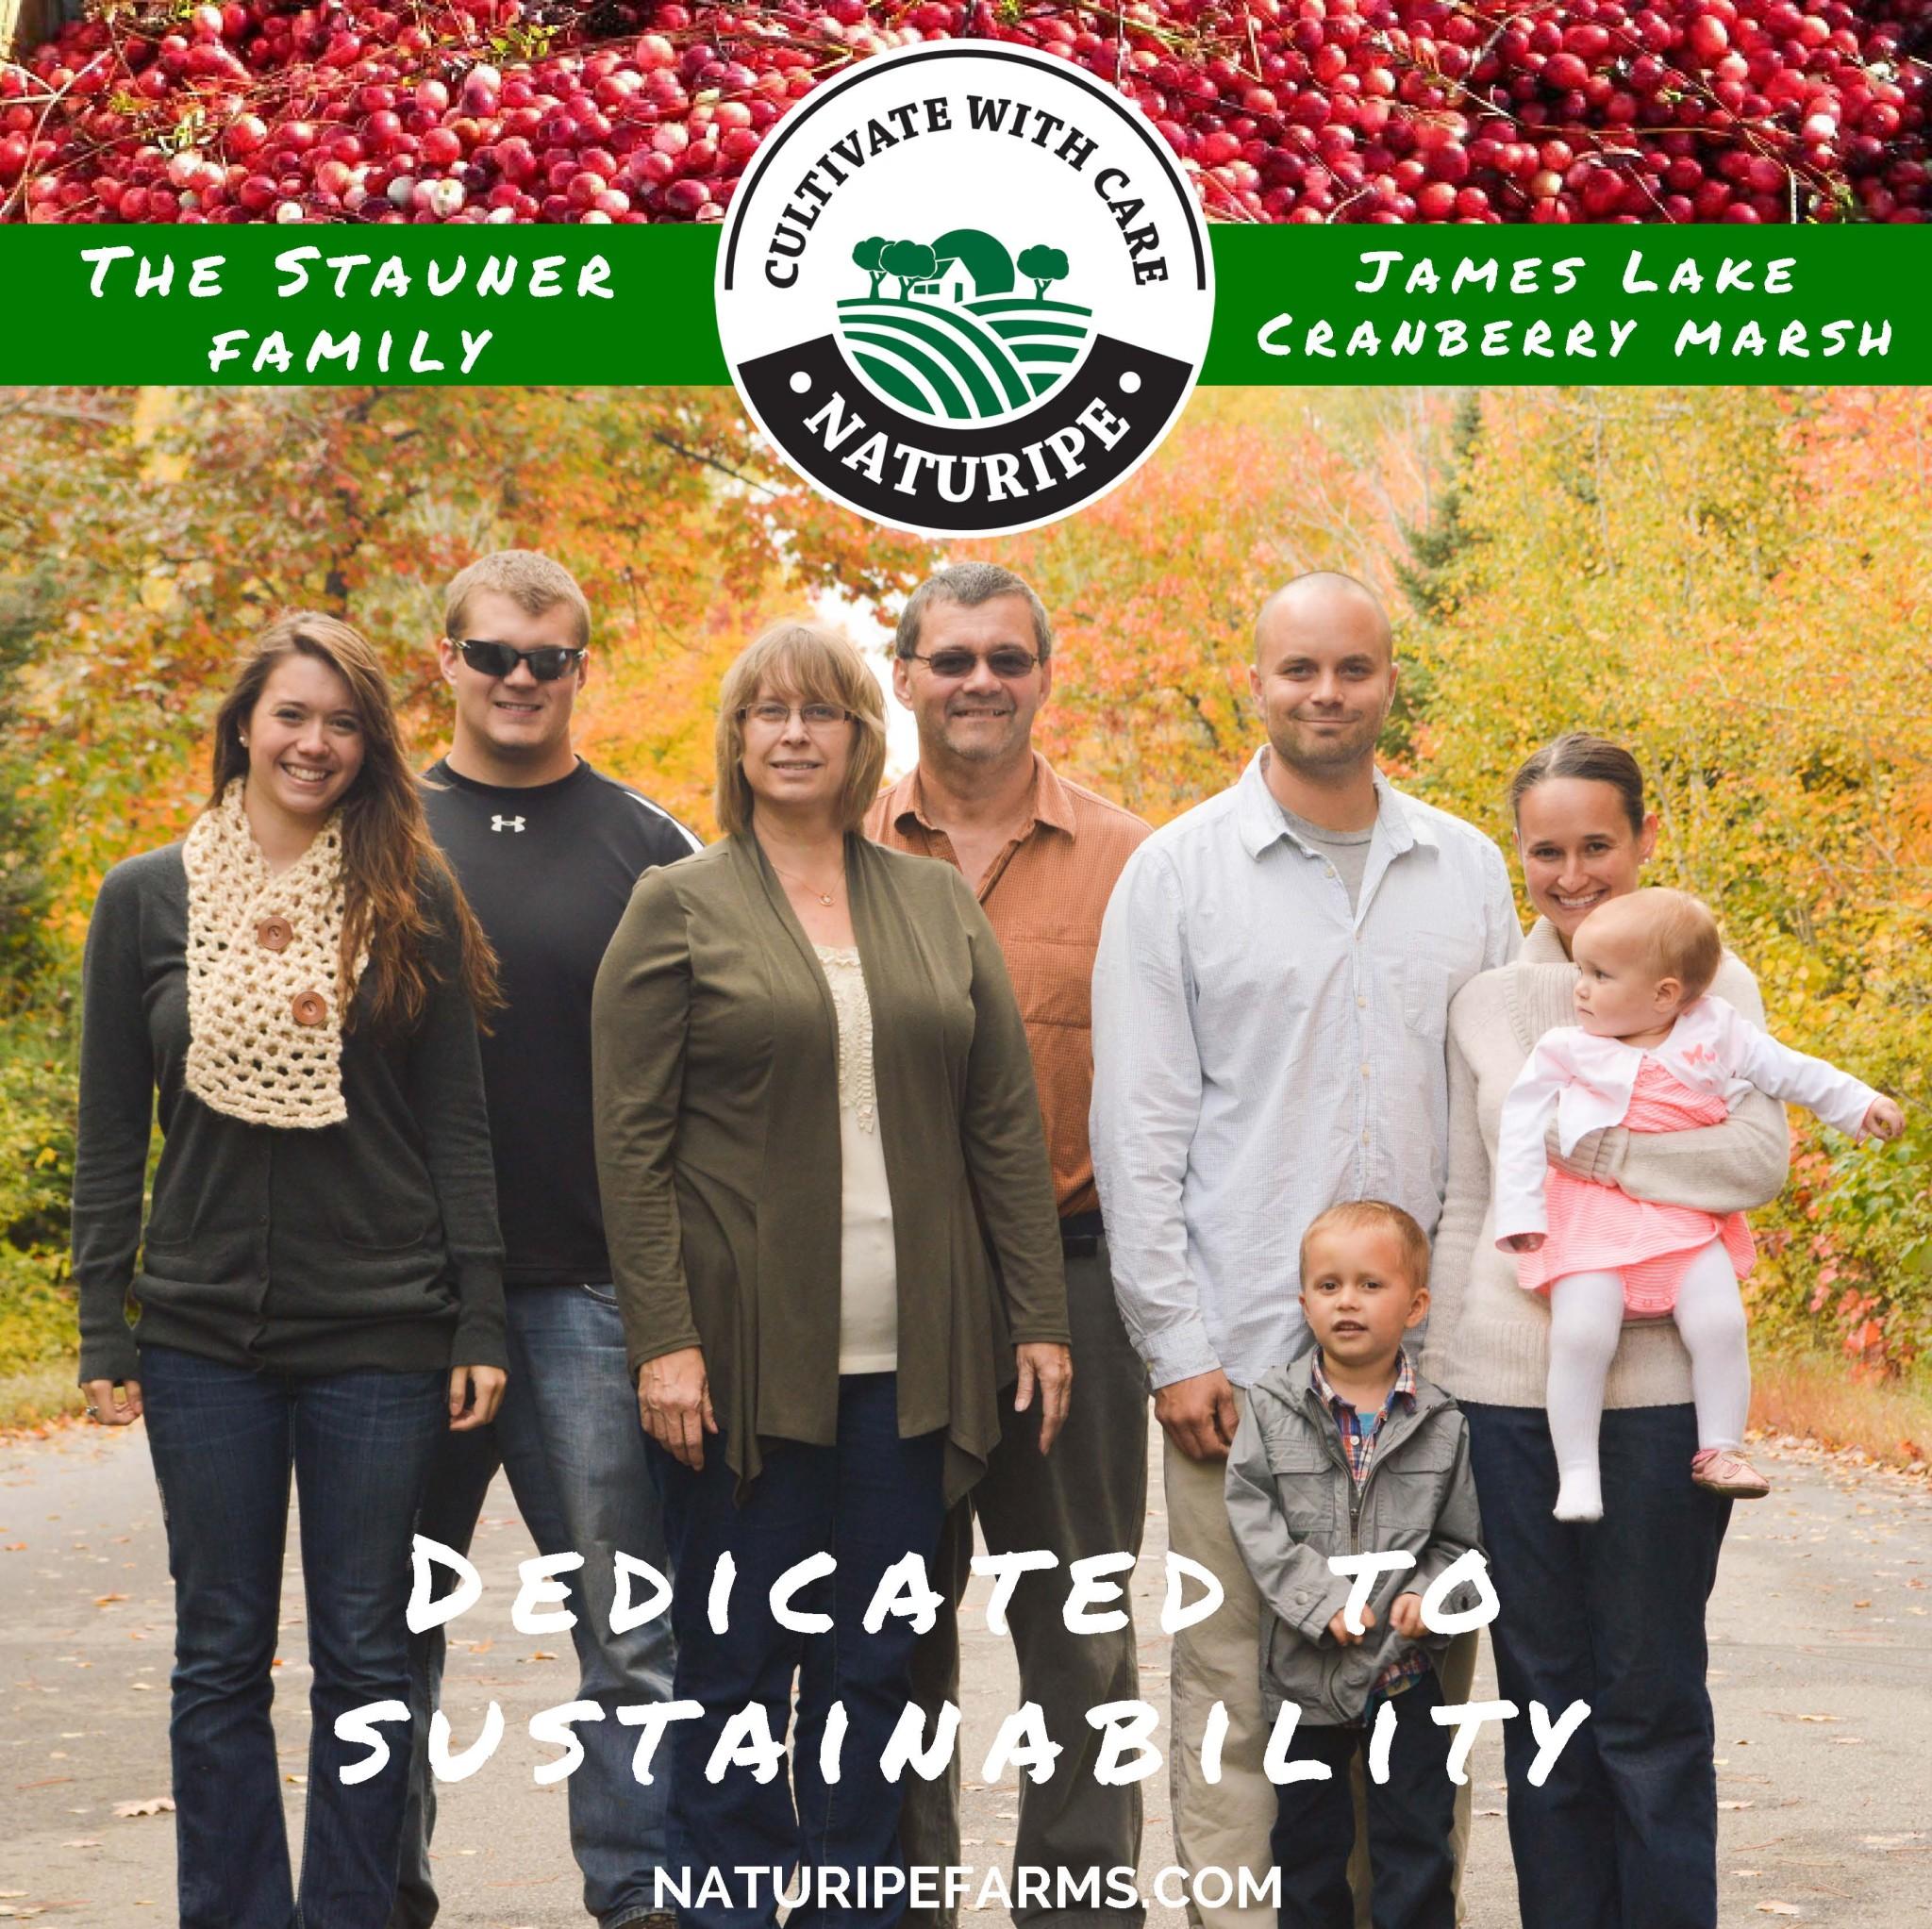 Stauner Family, James Lake Farm – Dedicated to Sustainability